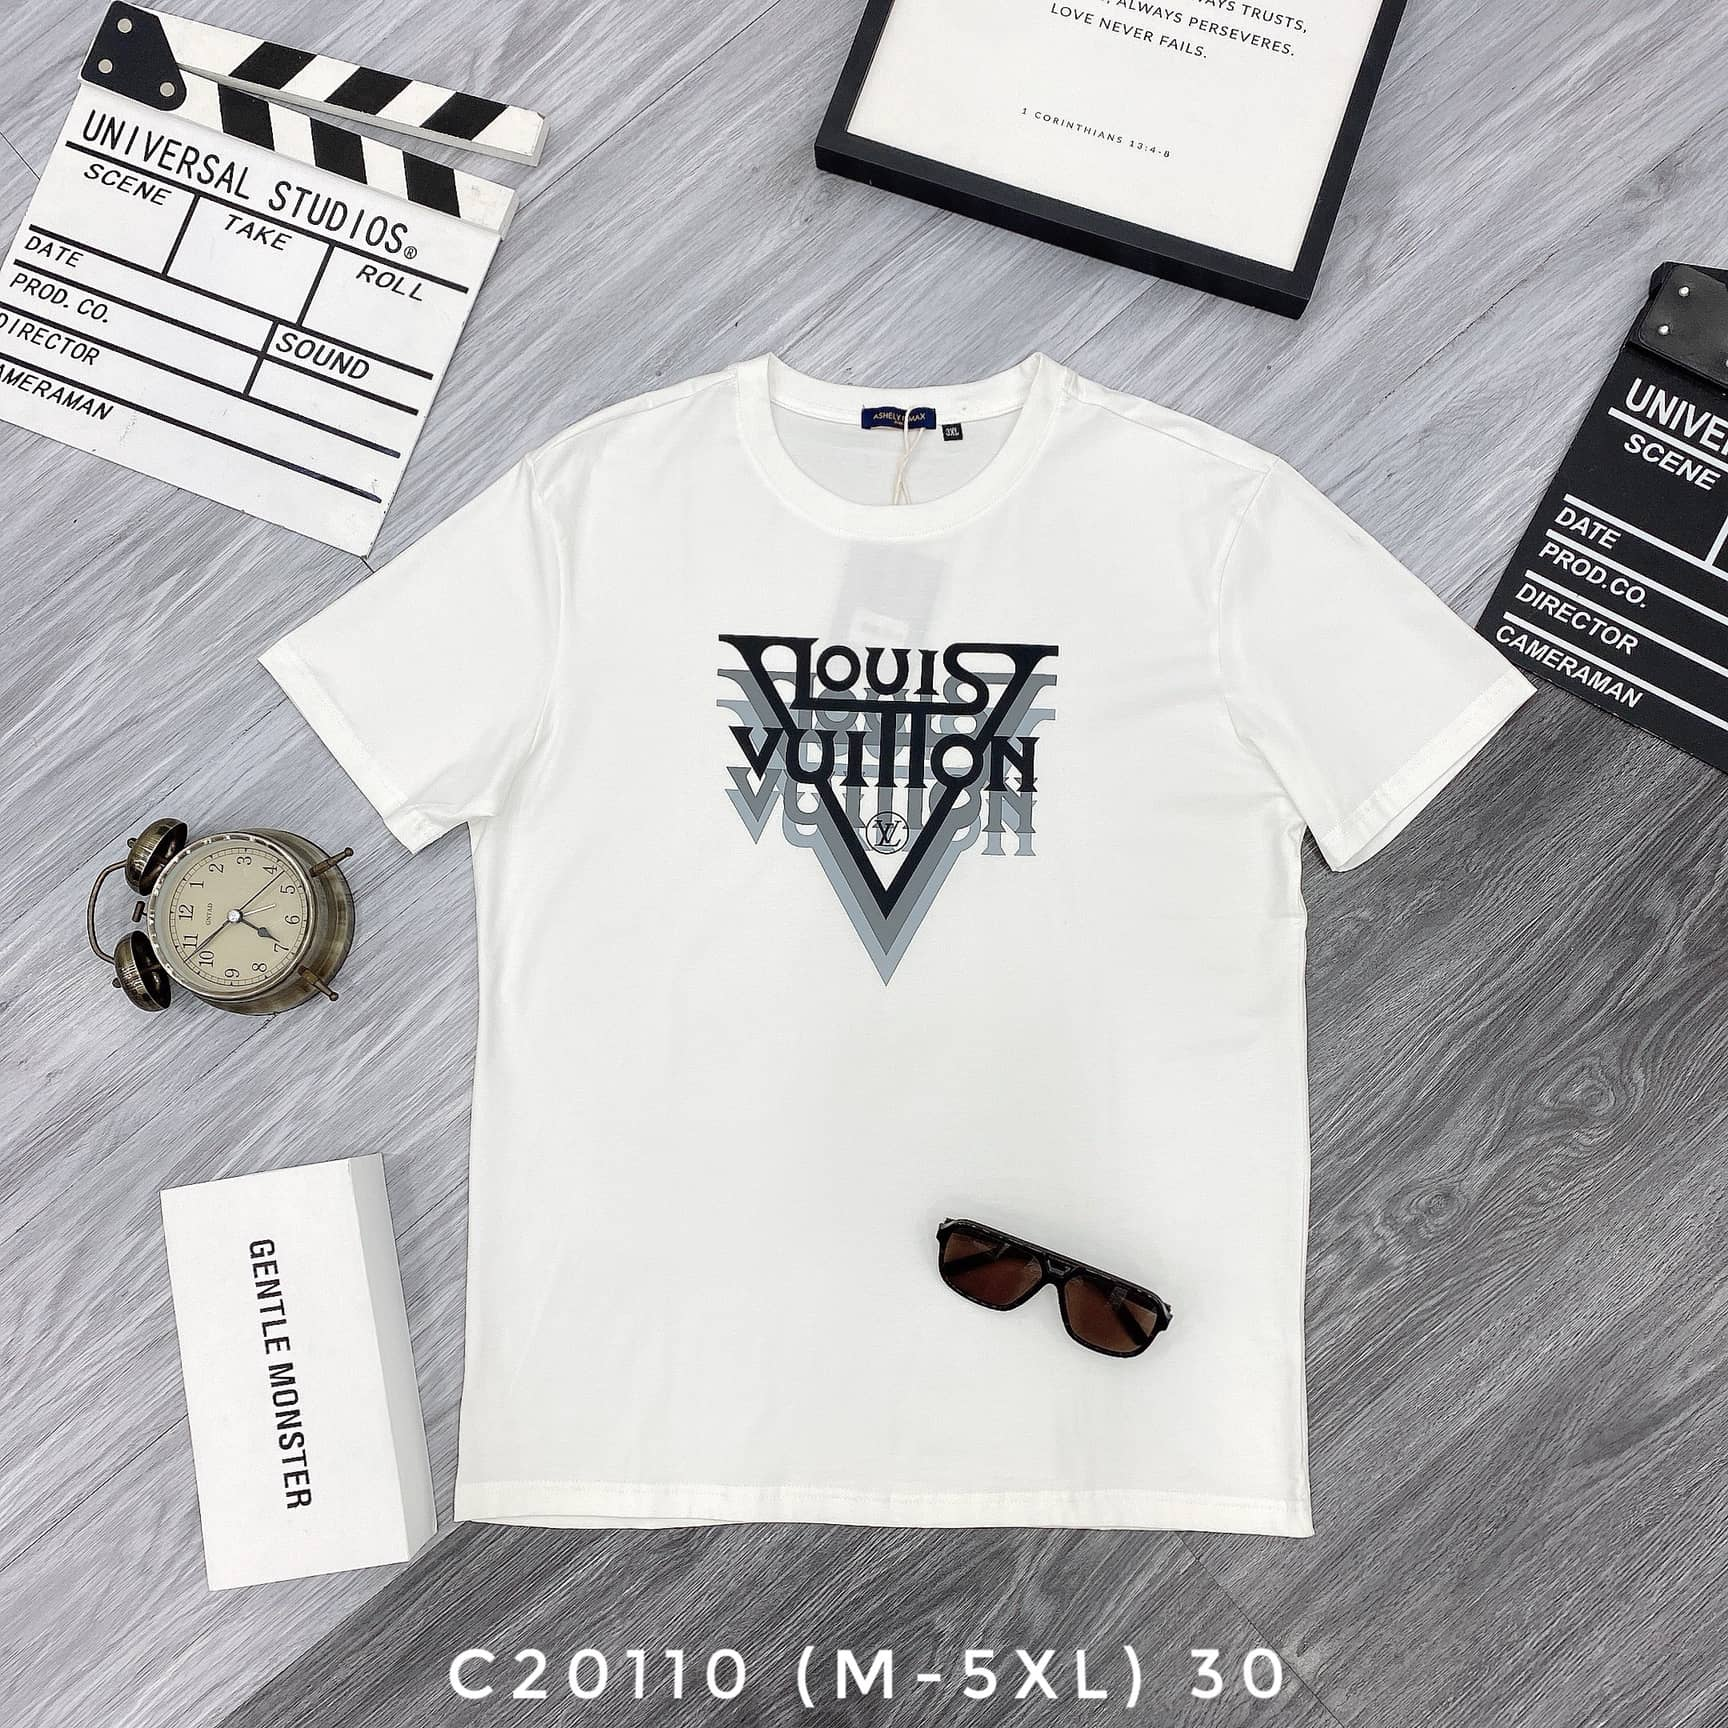 AT CỔ TRÒN C20110 (M-5XL)